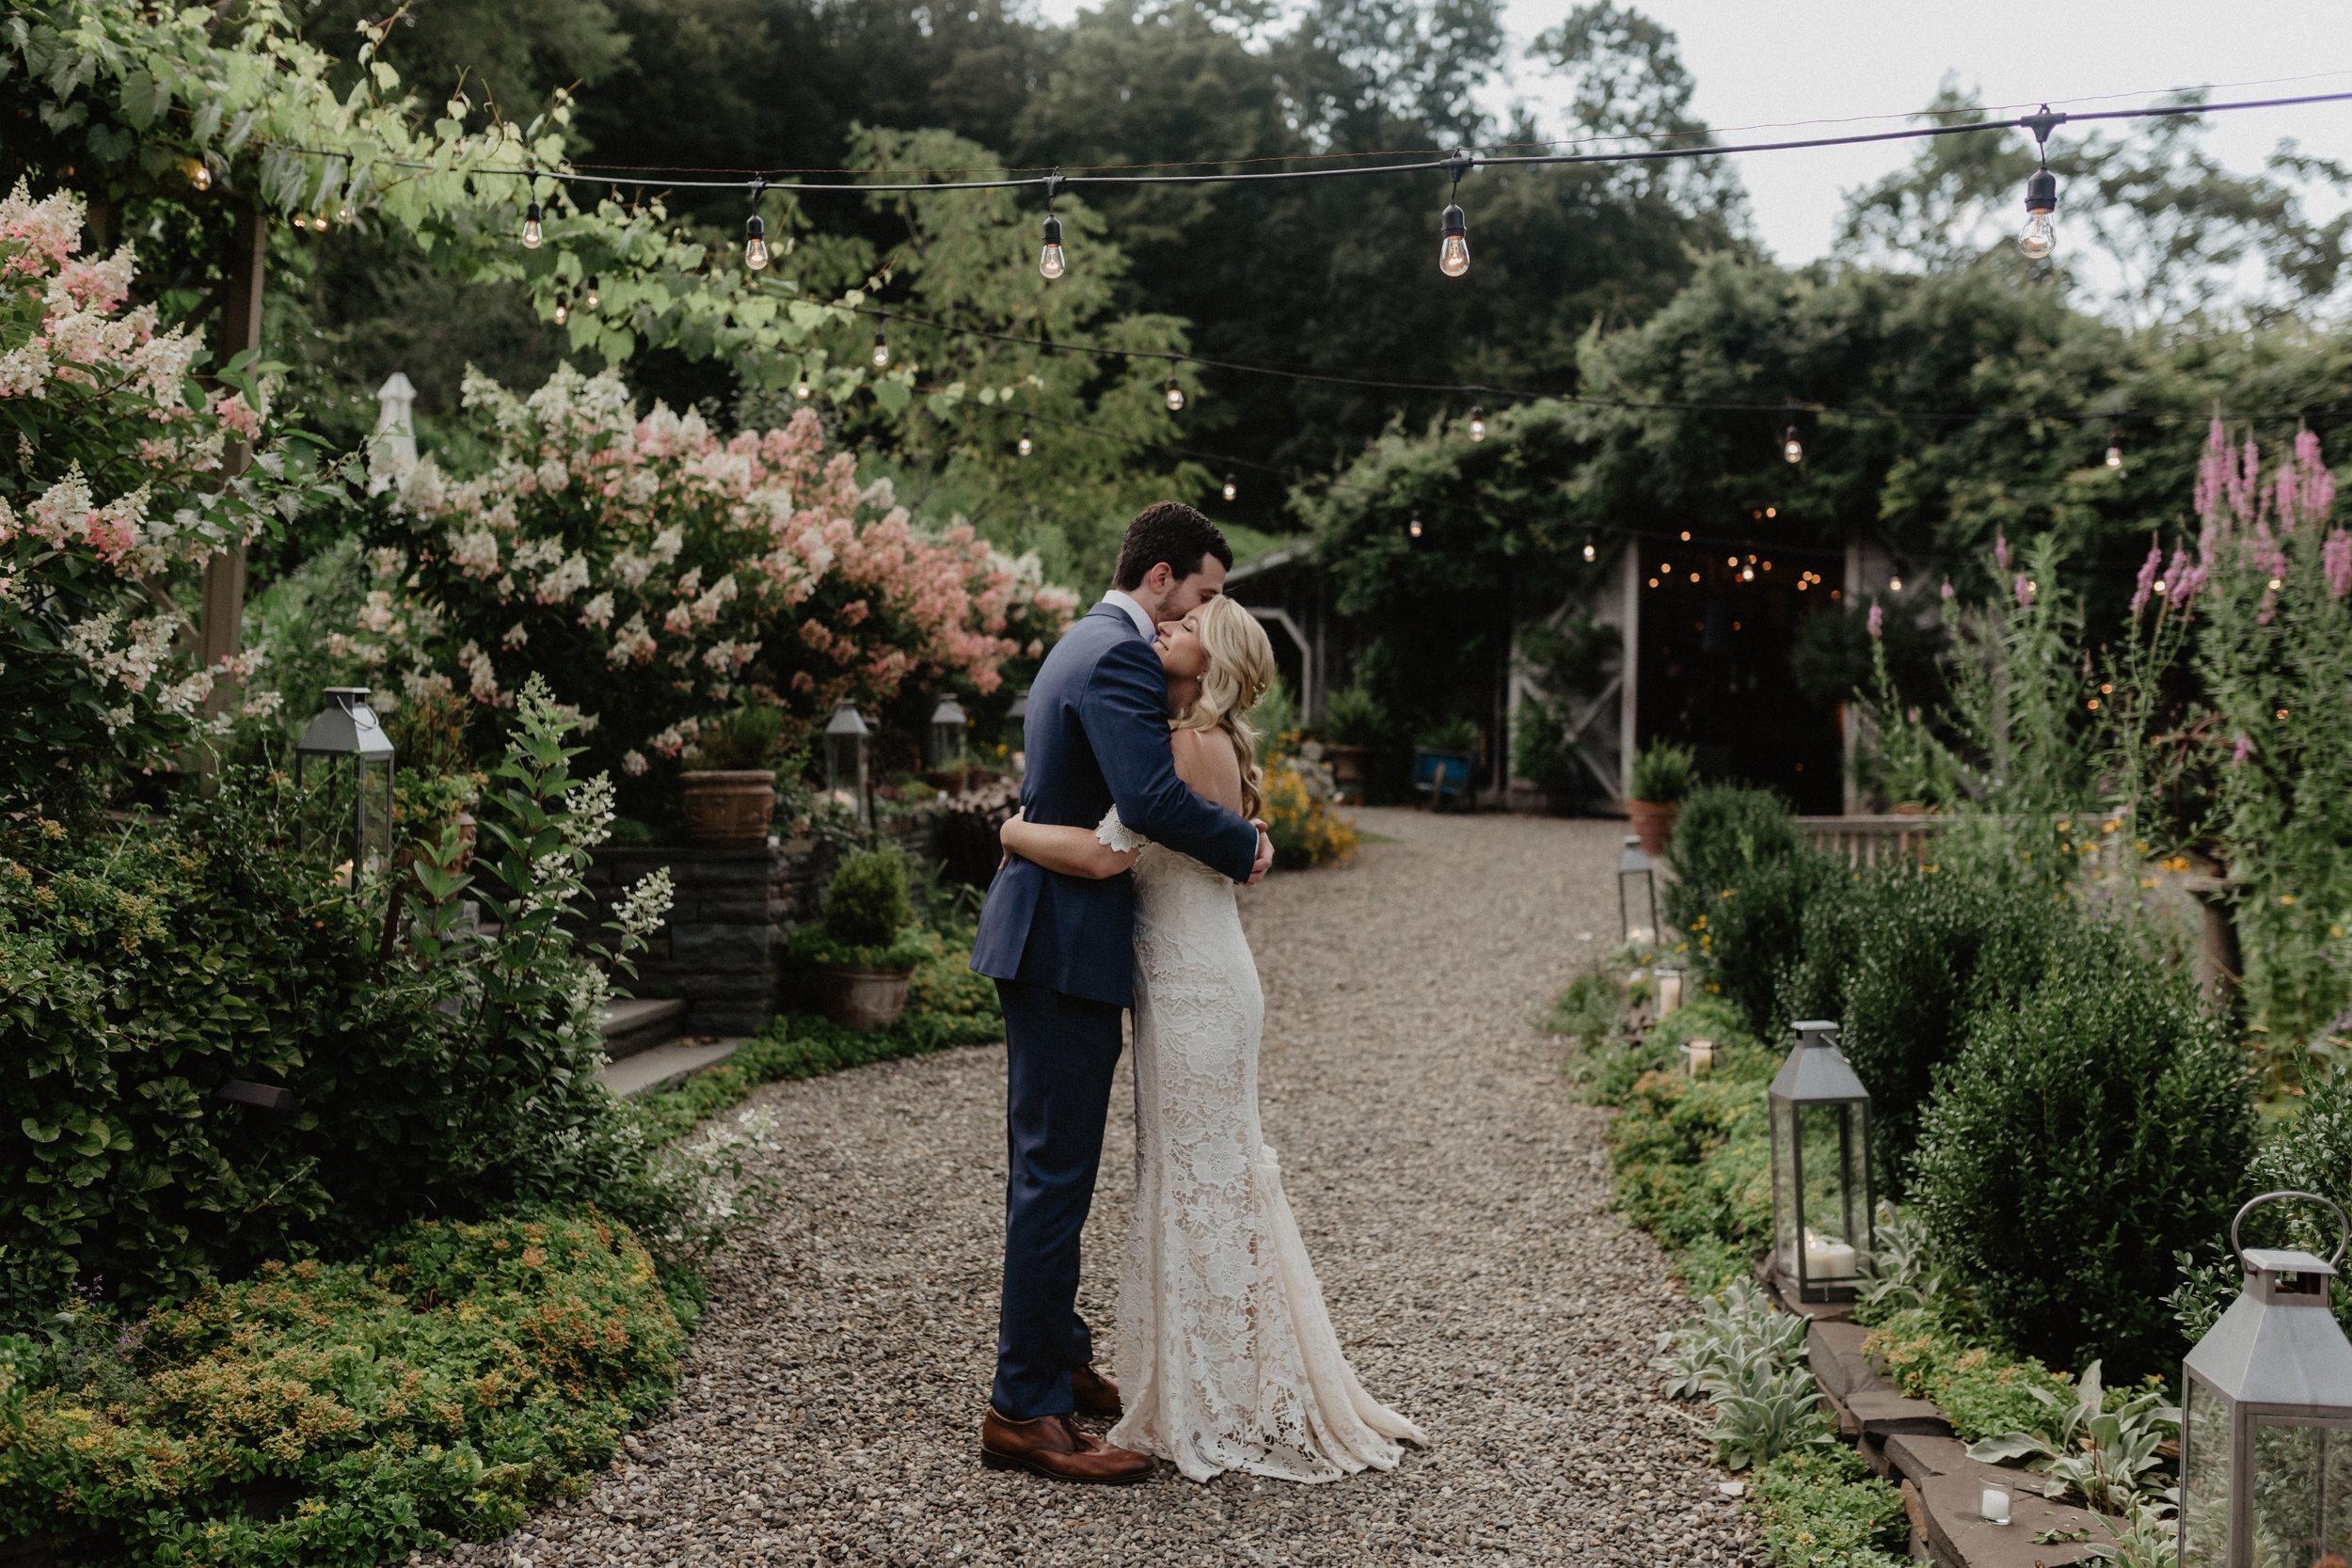 m-and-d-farm-wedding-95.jpg